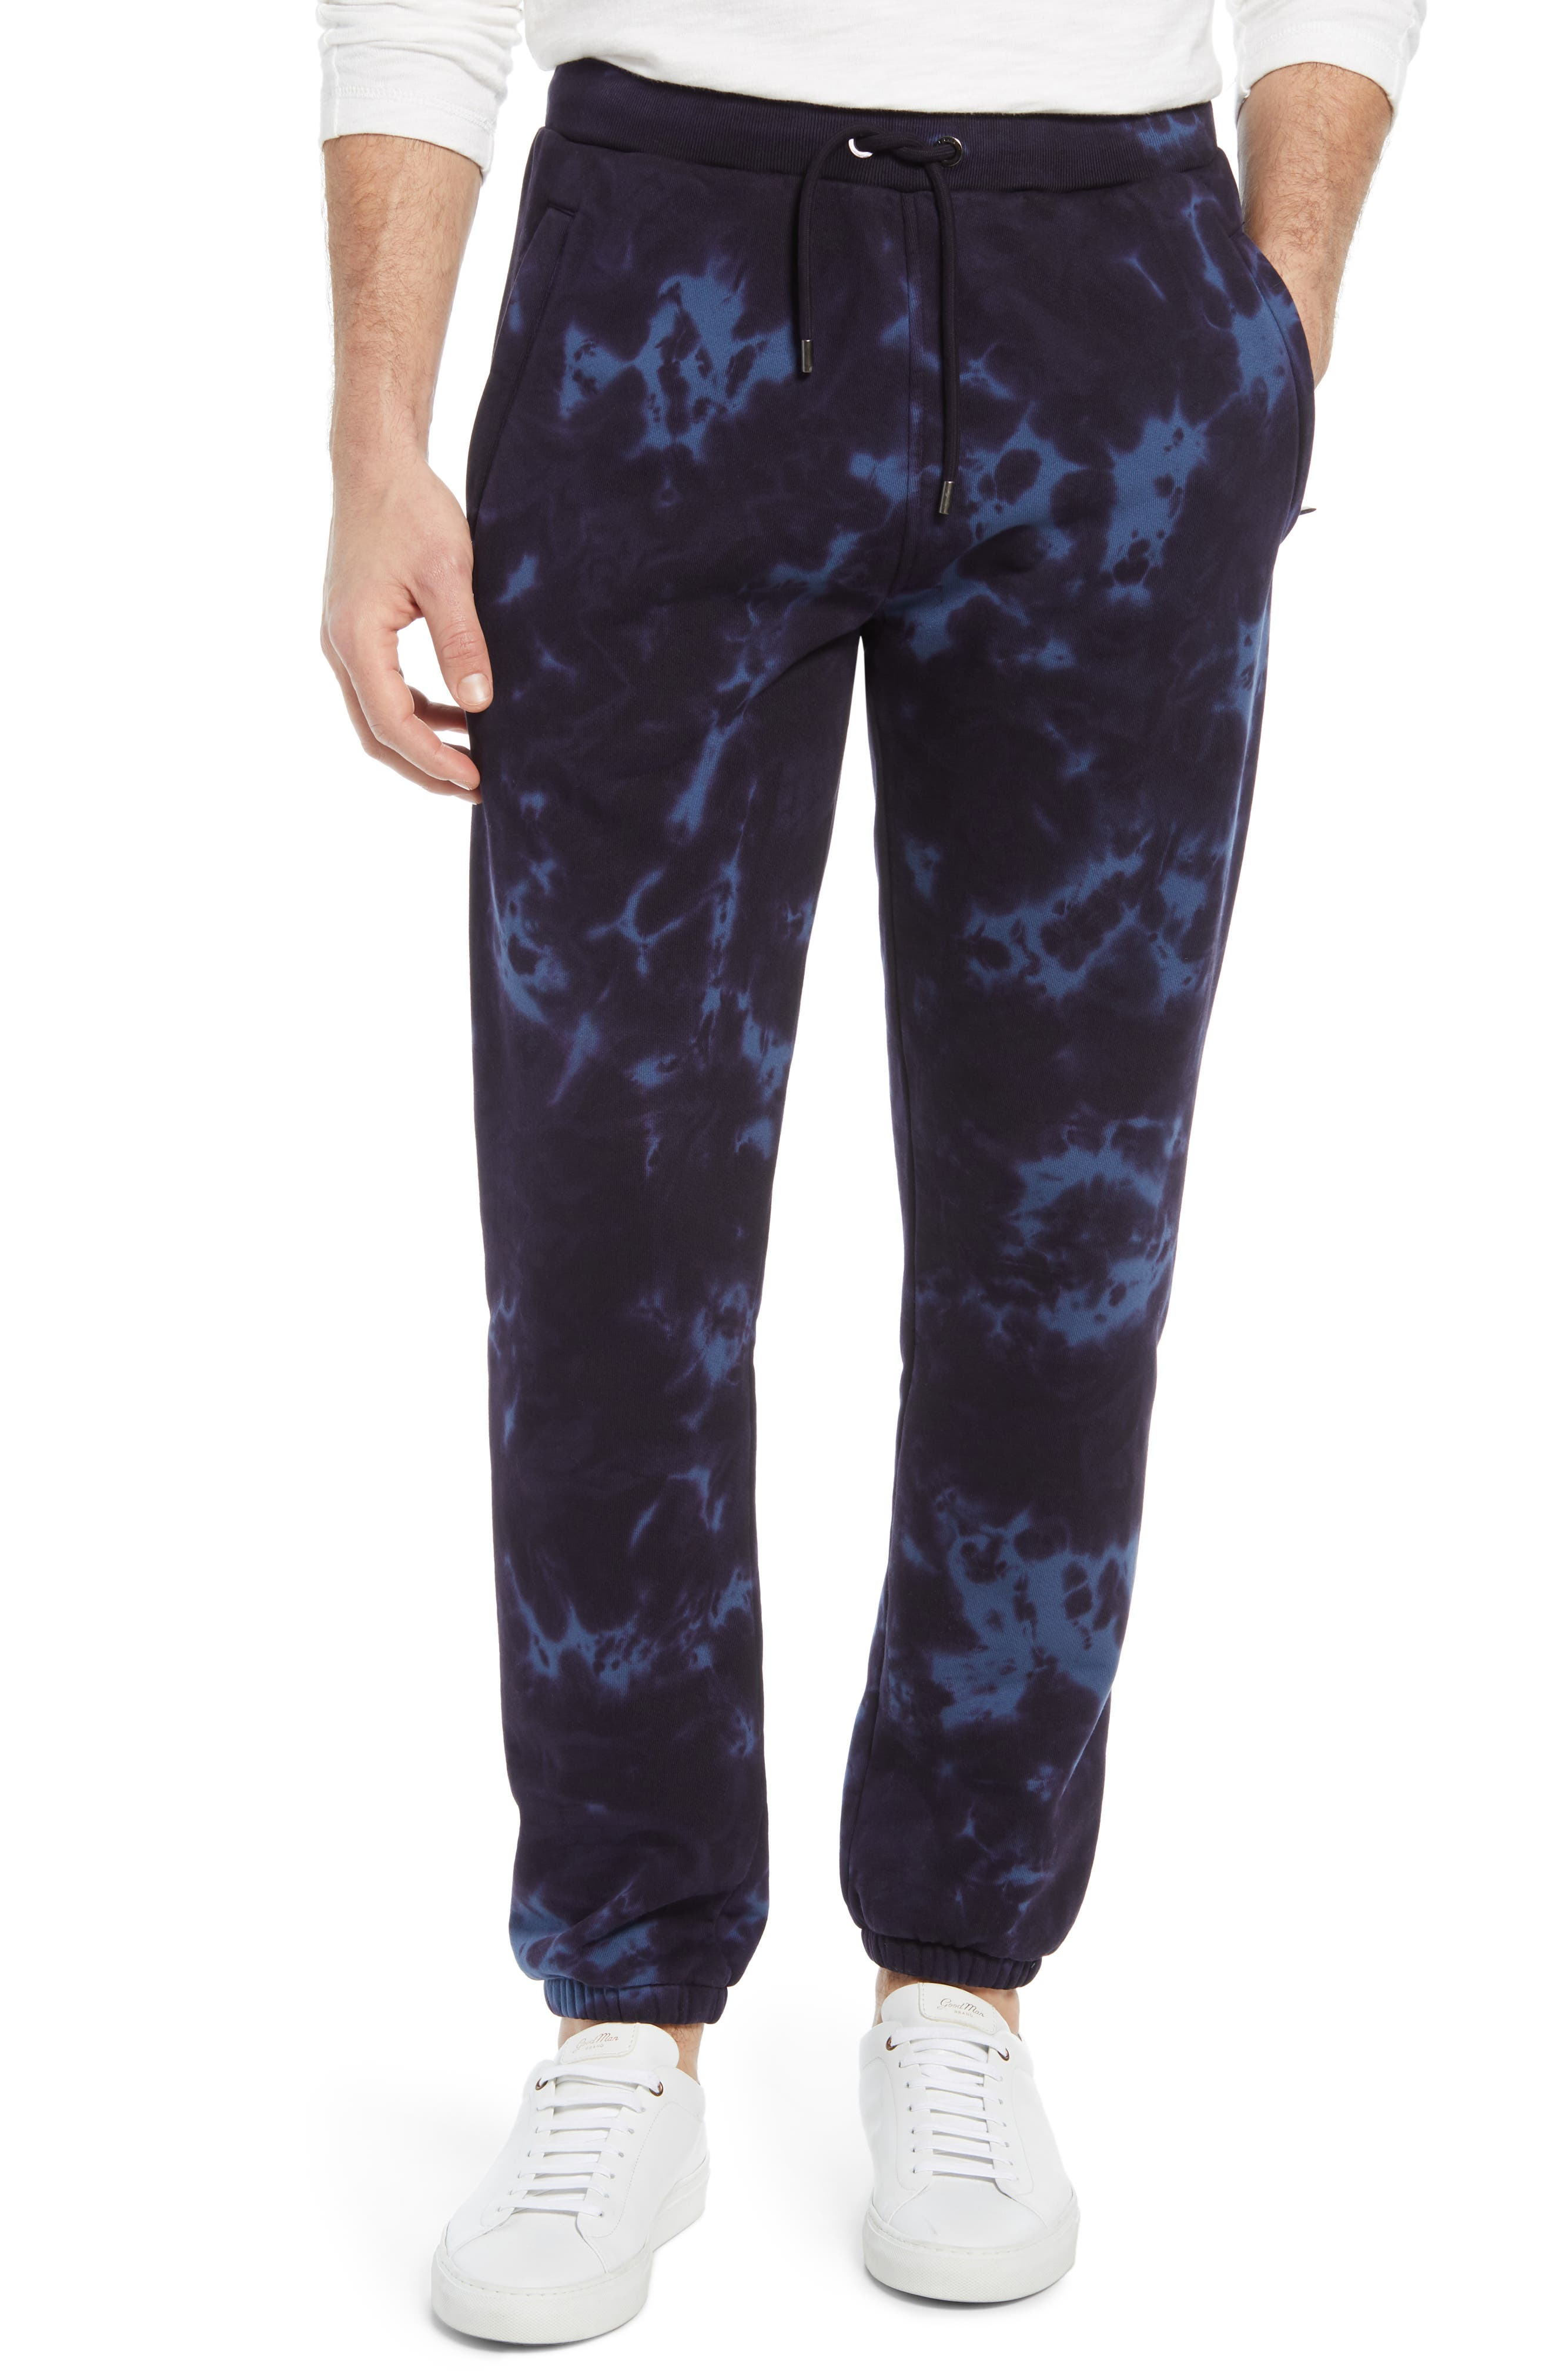 Men's Frame Tie Dye Men's Sweatpants